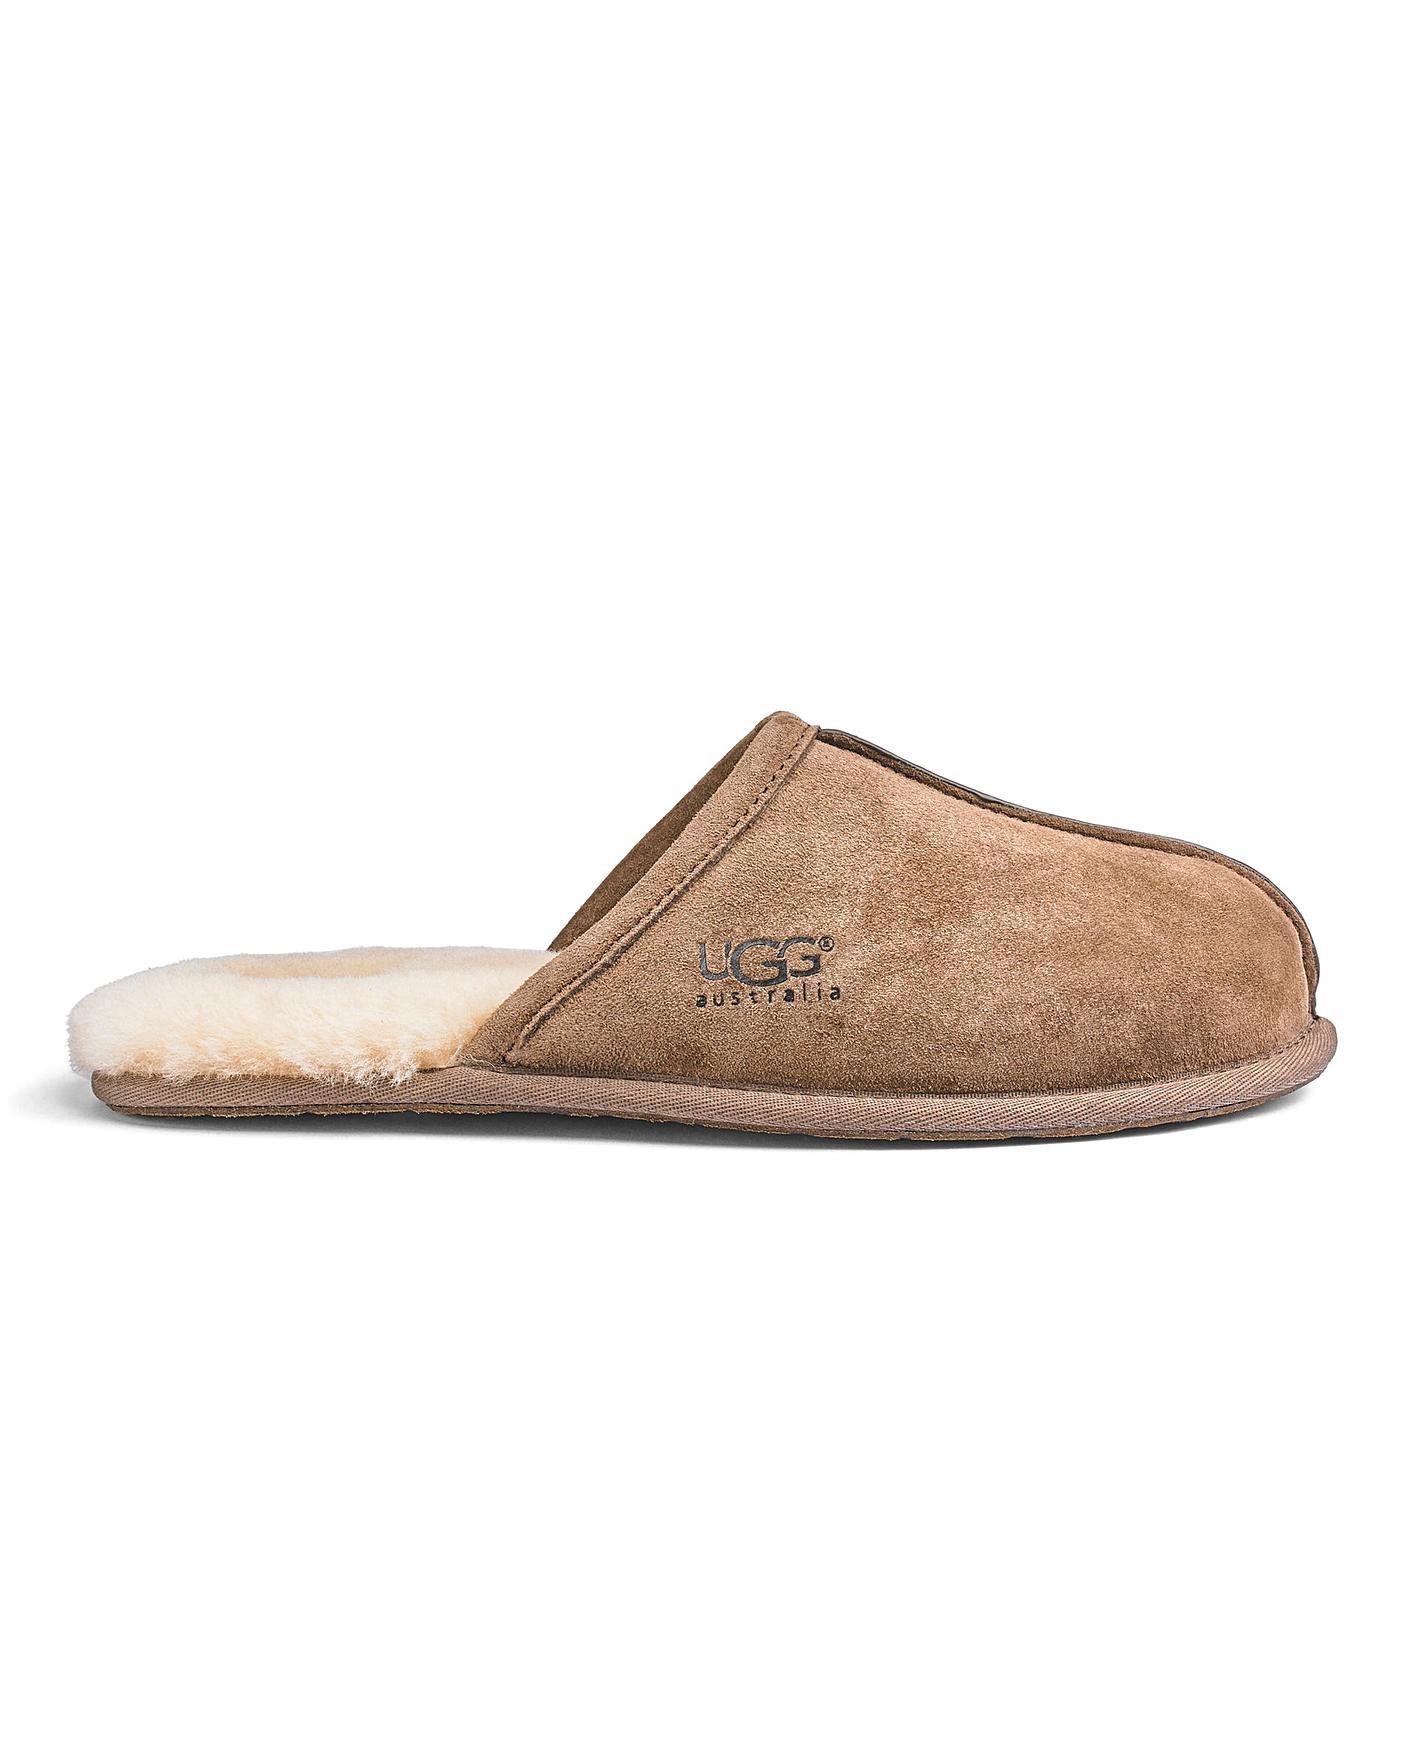 240aa8c4f6f UGG Suede Scuff Slippers